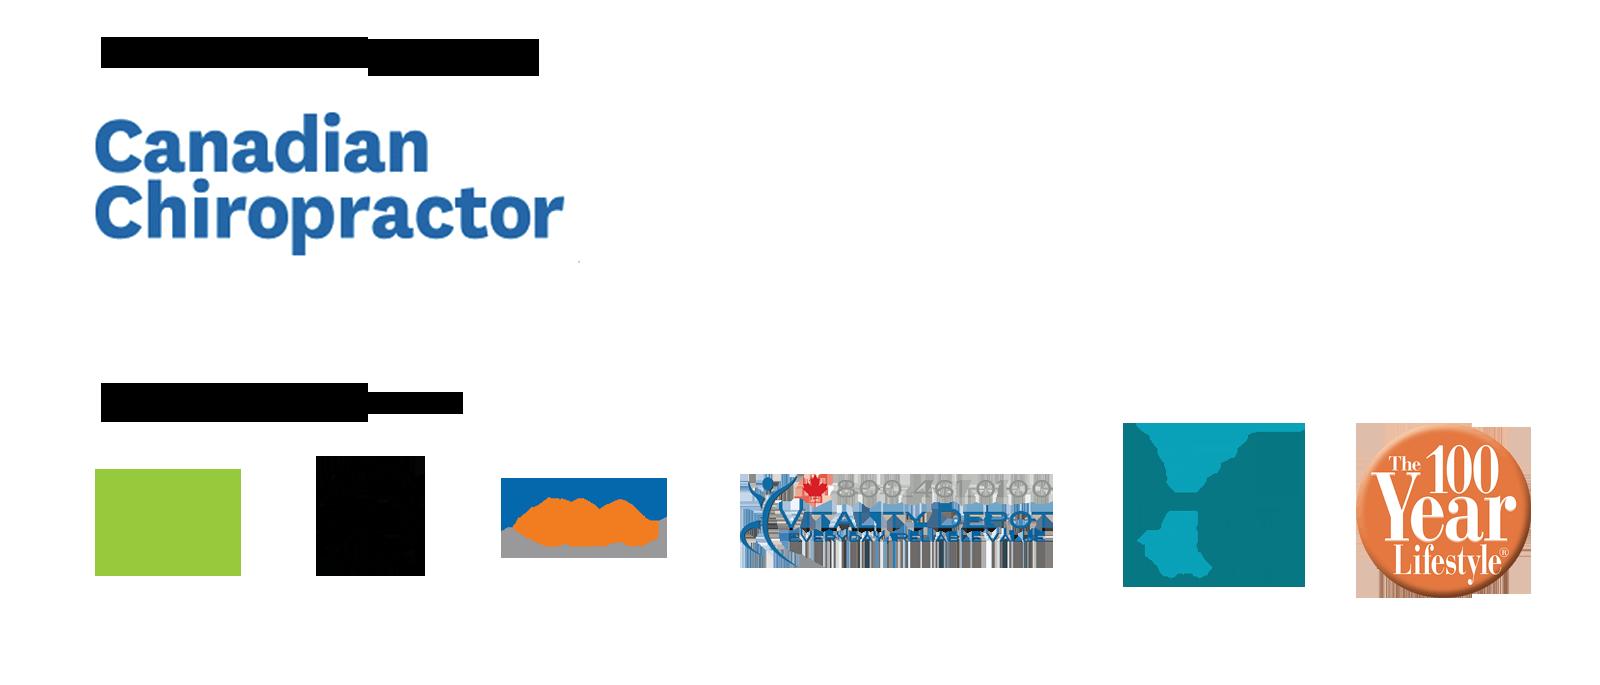 3737-canada-vision-sponsors12-7